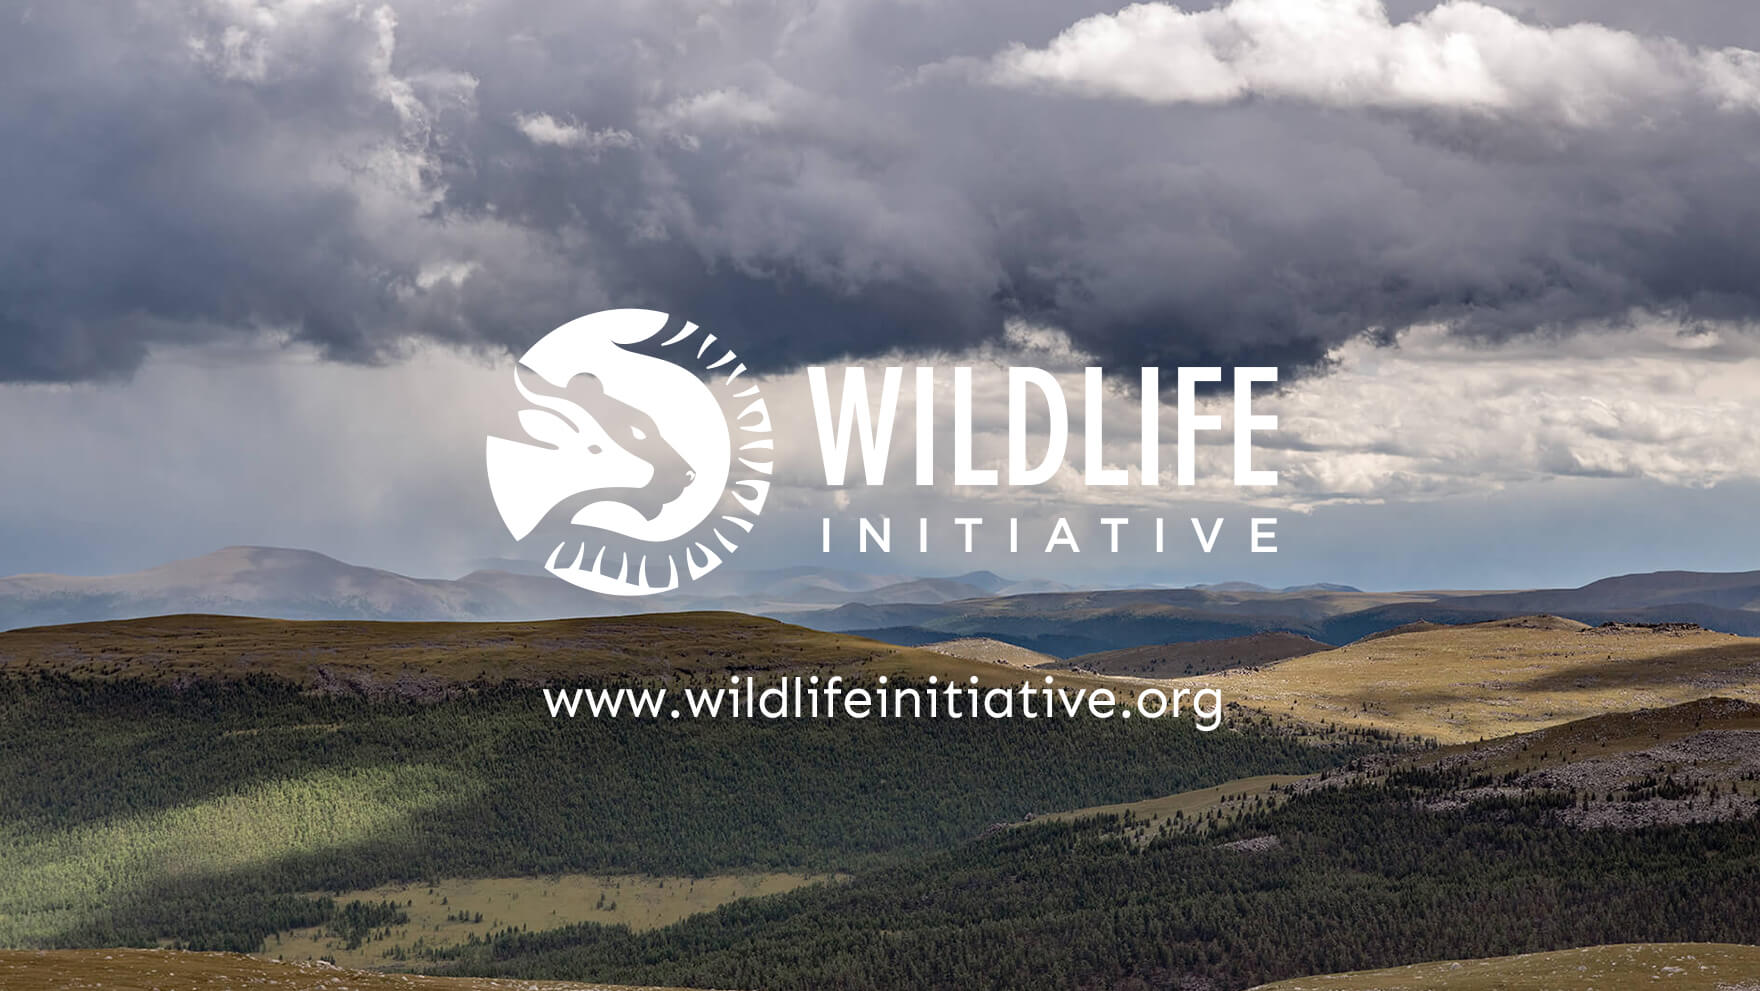 Wildlife Initiative